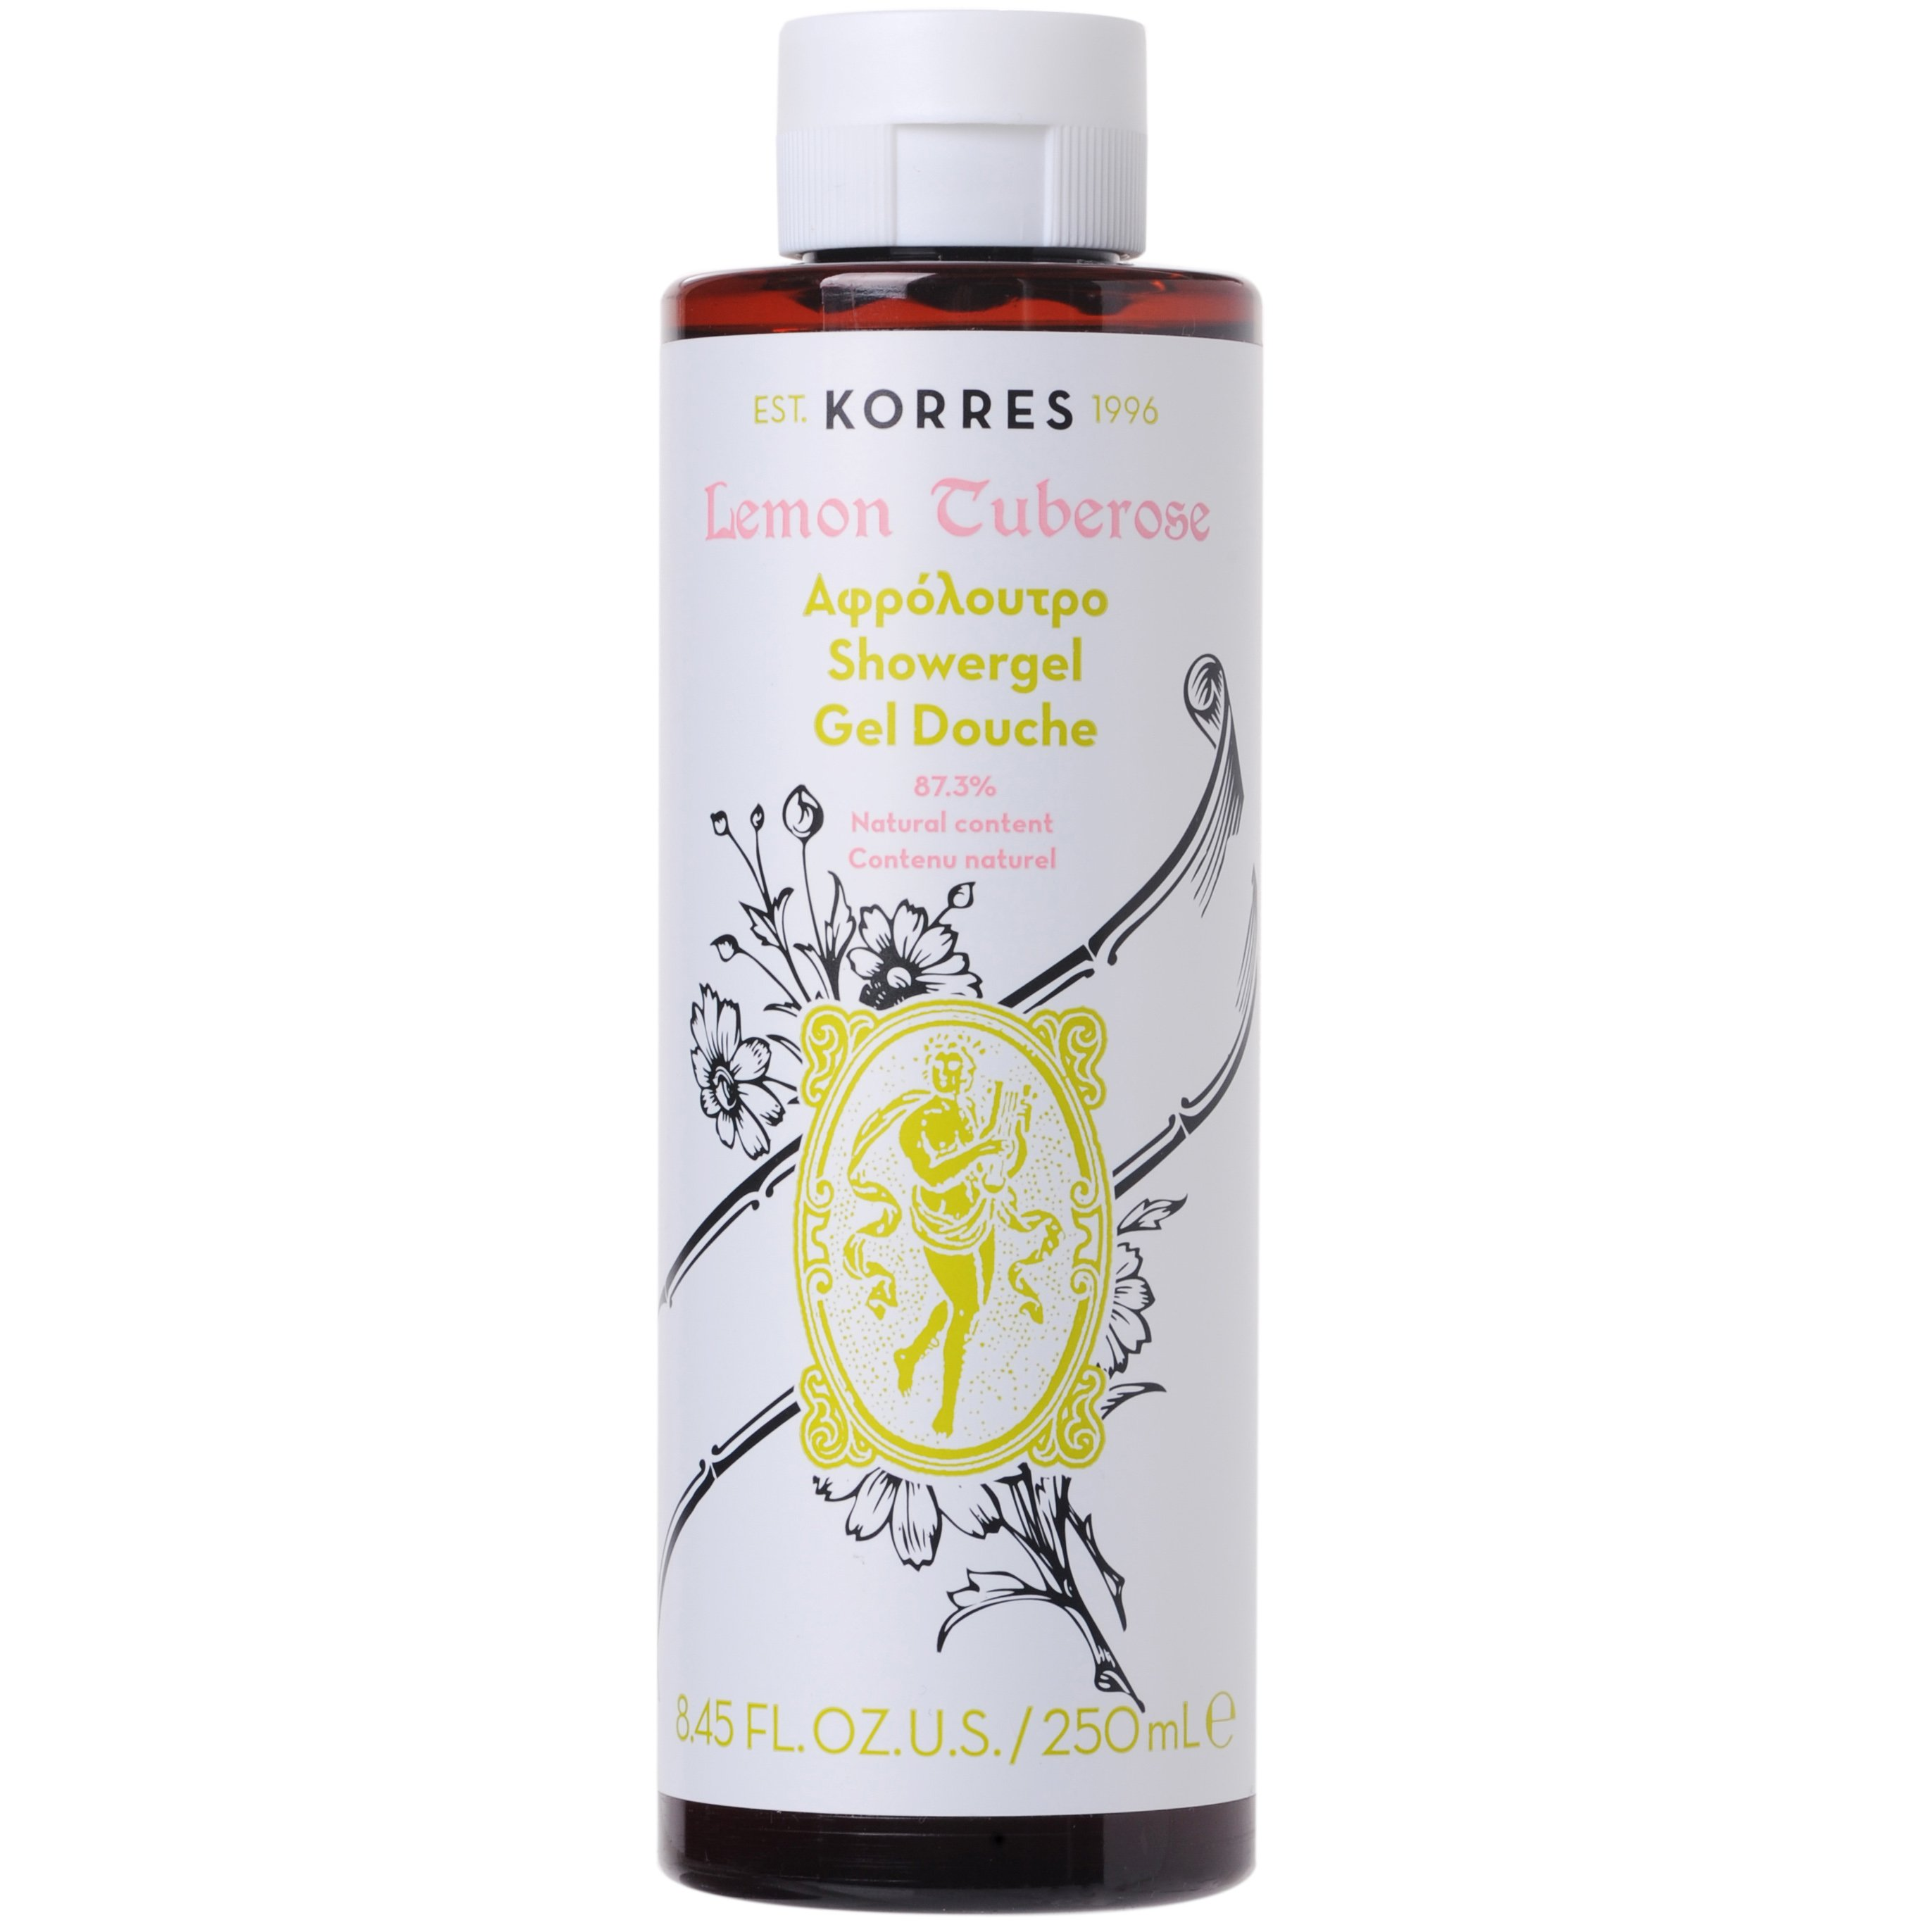 Korres Showergel Lemon Tuberose Αφρόλουτρο με Άρωμα Λεμόνι 250ml